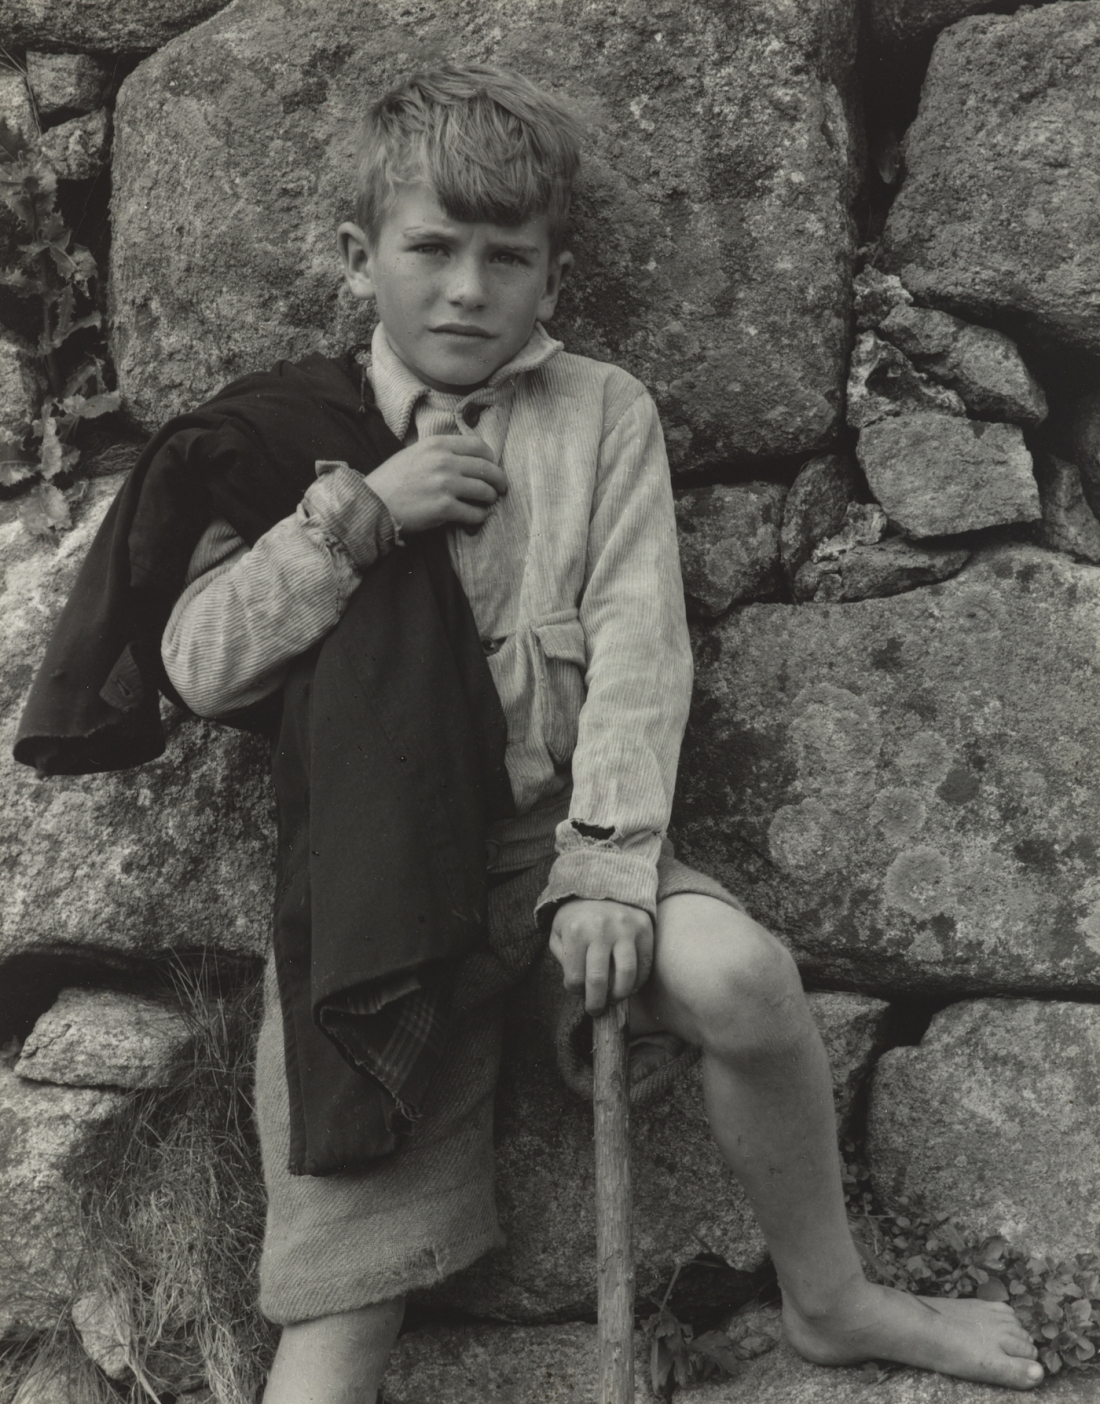 Paul Strand, John Angus MacDonald, South Uist, Hebrides, 1954 Gelatine silver print, 11.4 x 14.6 cm © Paul Strand Archive